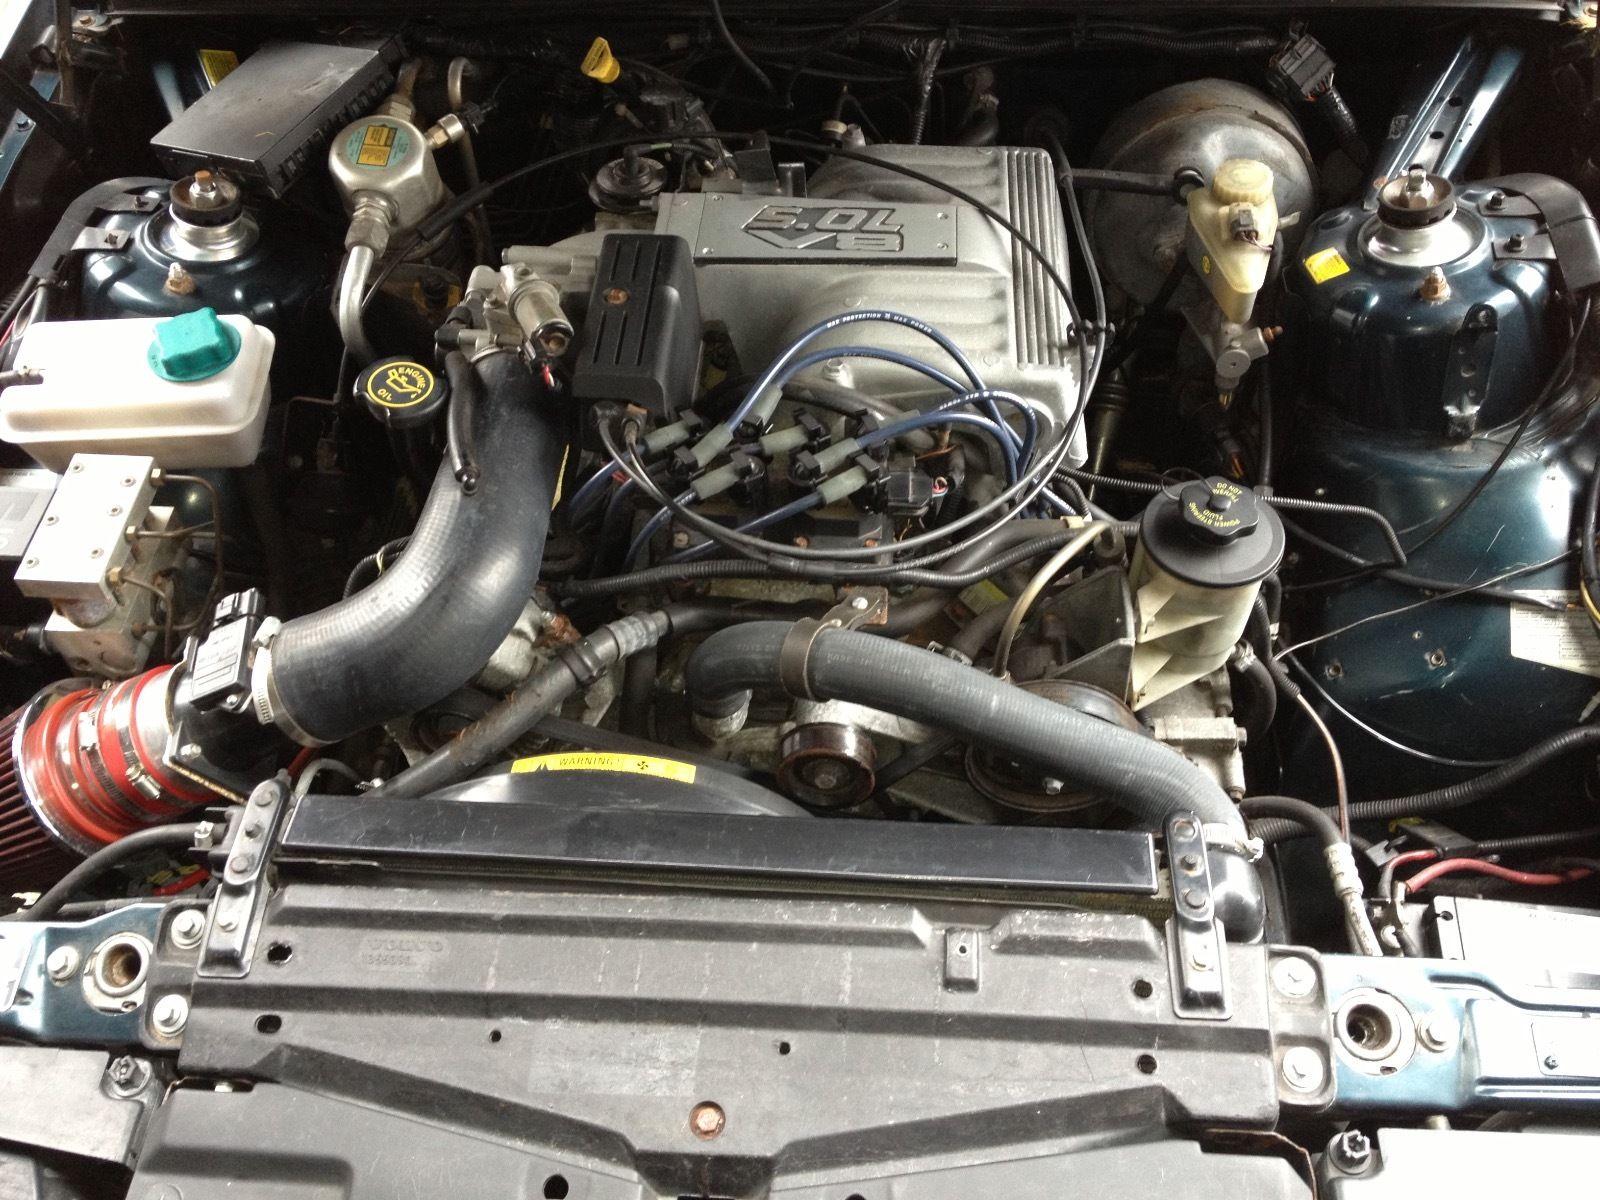 Daily Turismo: Converse V8 Swap: 1993 Volvo 940 Wagon